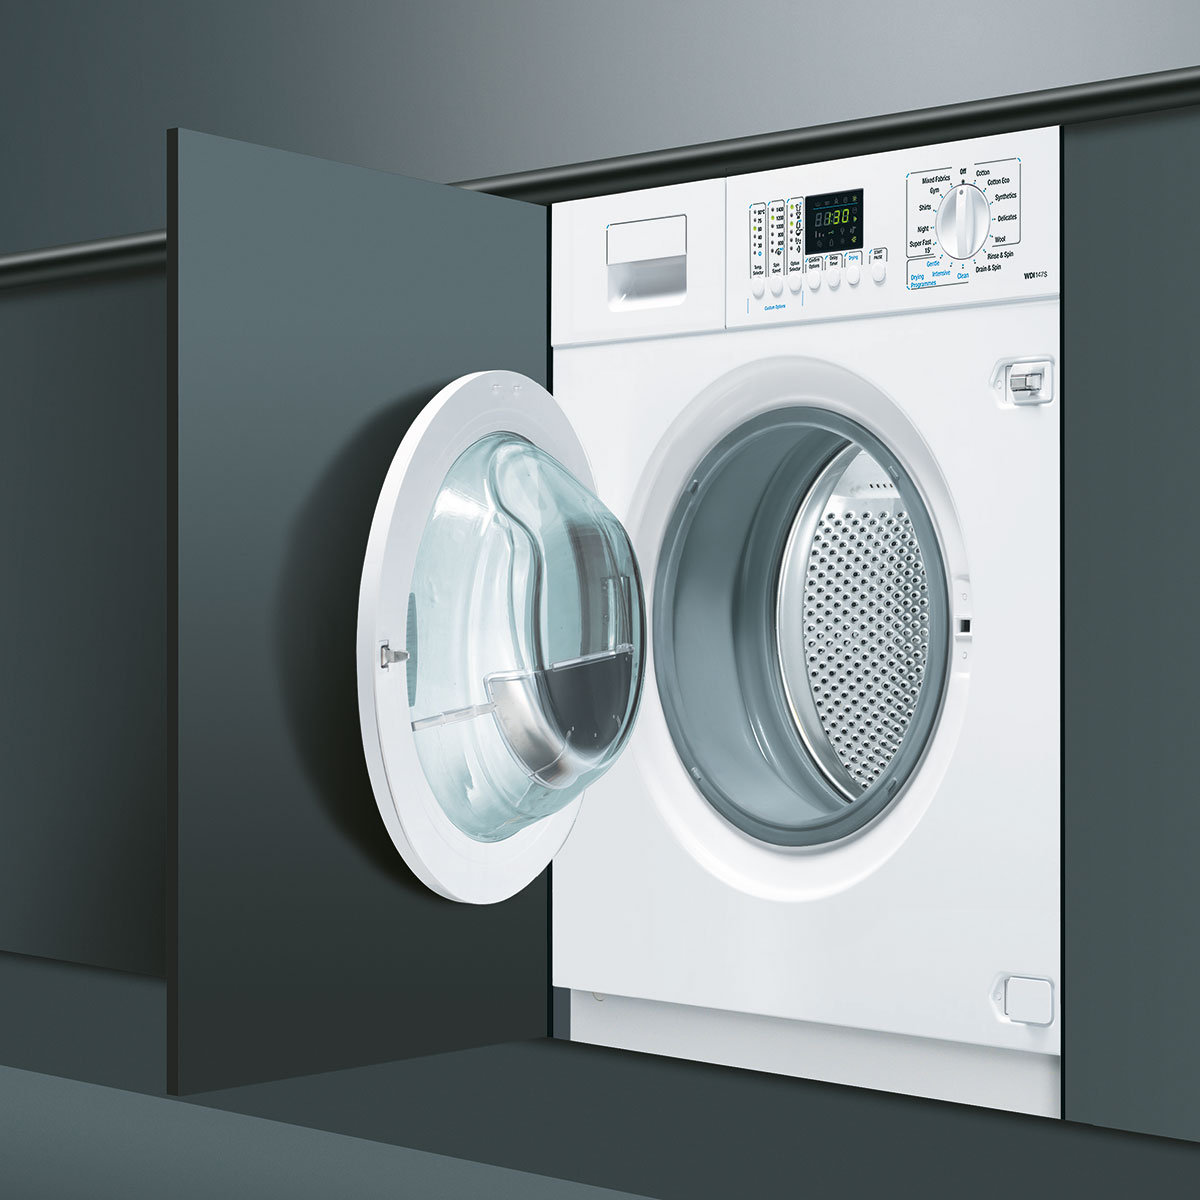 7kg Built In Washer Dryer Baumatic